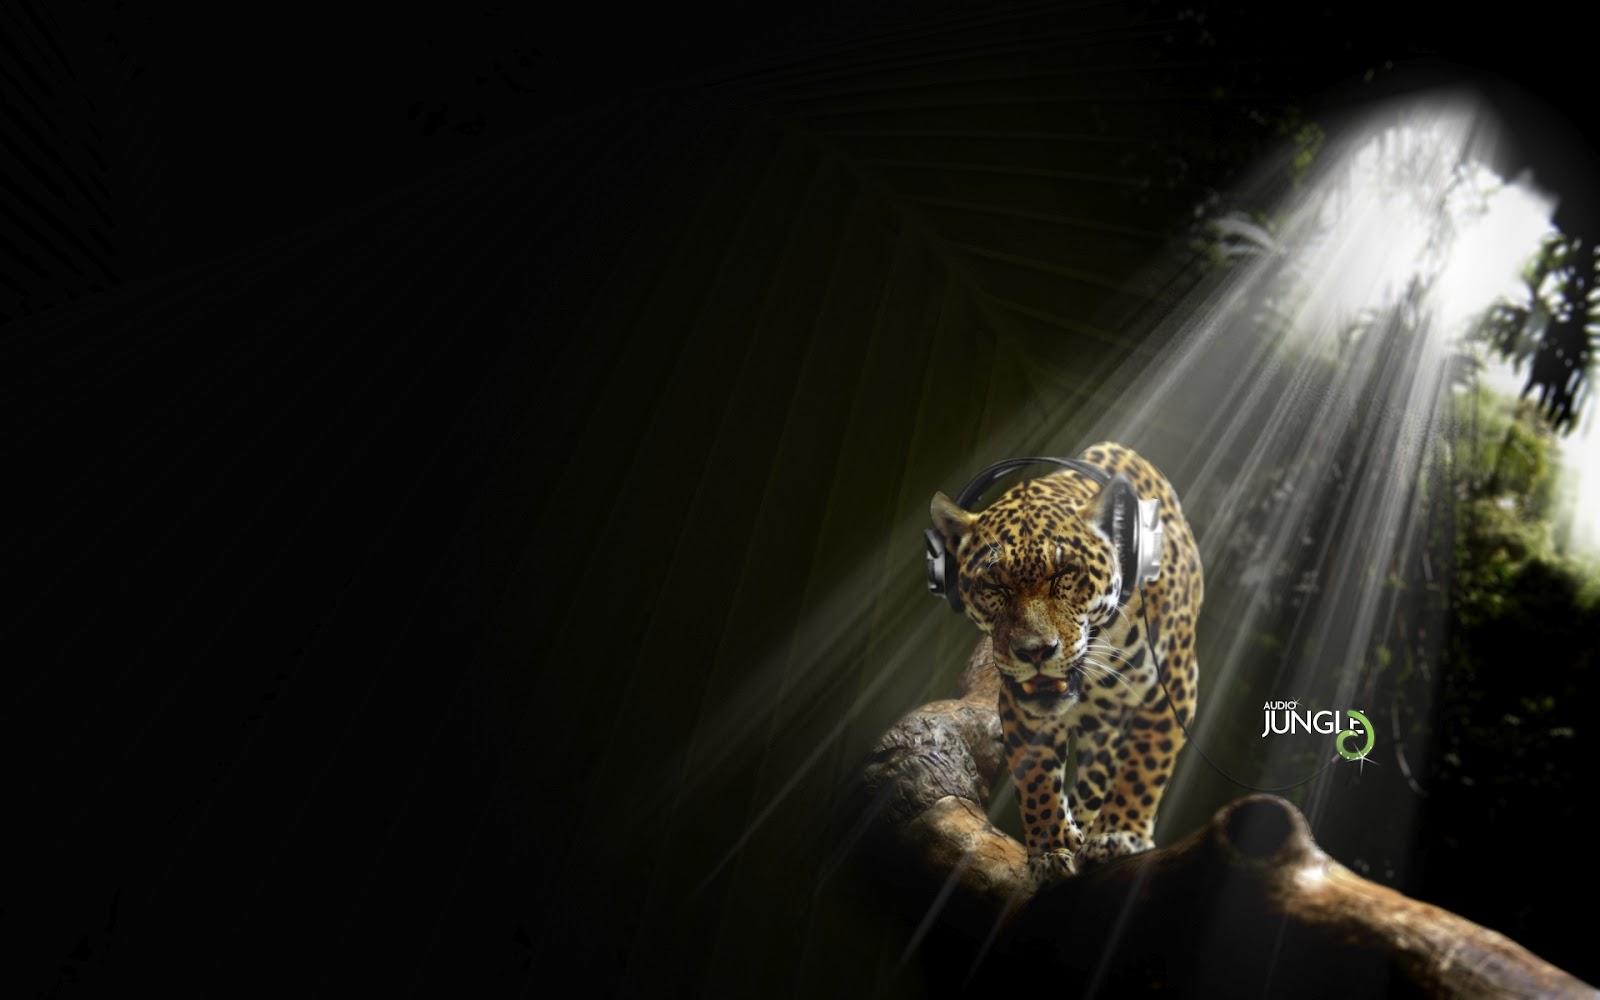 http://2.bp.blogspot.com/-cdxKKtcE-b8/UFCzsw7m_lI/AAAAAAAACCI/Ld9HjIJti4M/s1600/jaguar-audio-jungle.jpg